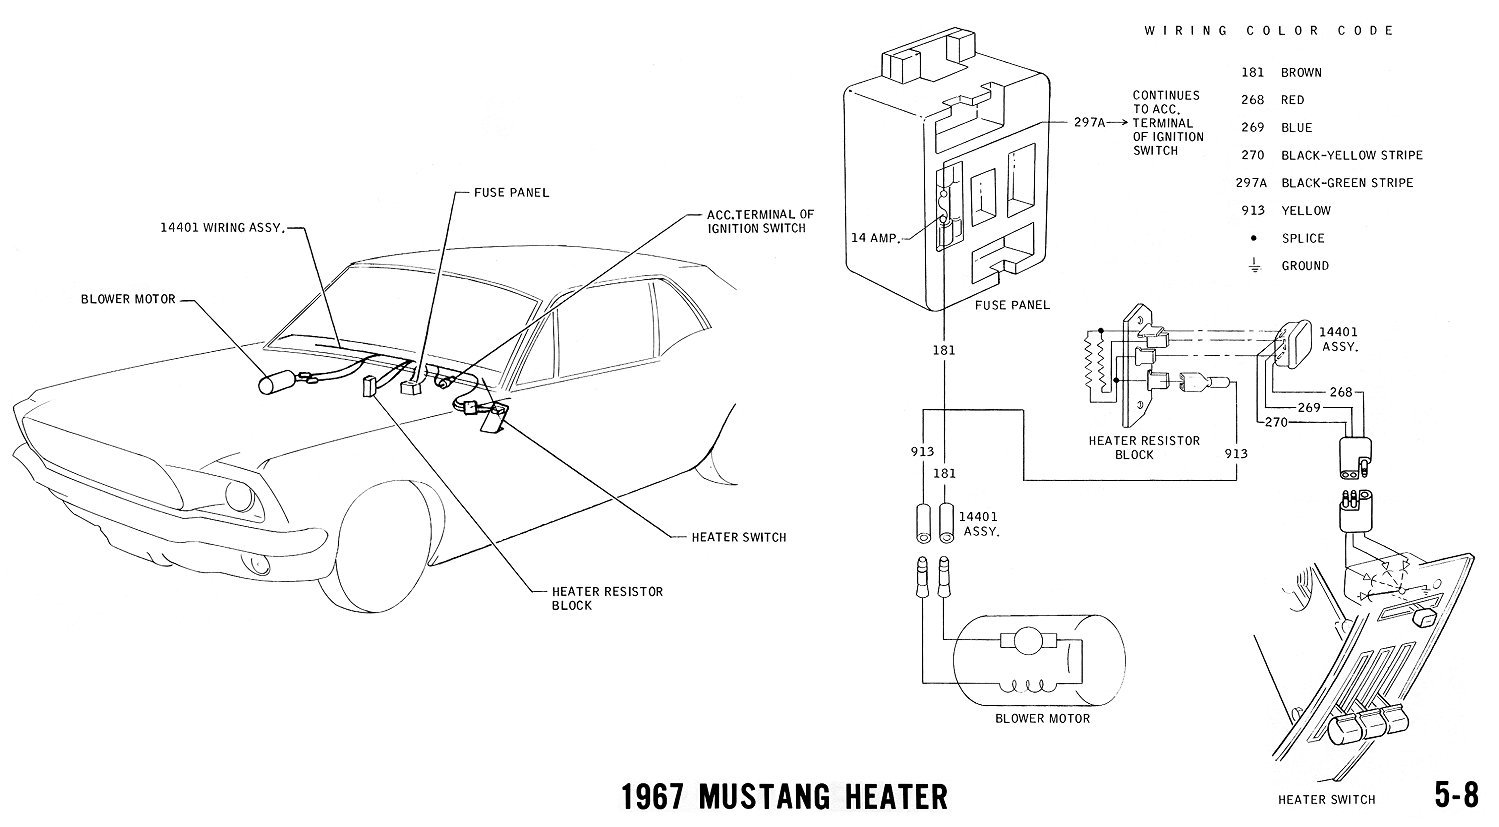 [DIAGRAM_5UK]  GB_9269] Amp Gauge Wiring Diagram Mustang Free Diagram | 1966 Mustang Ammeter Wiring Diagram |  | Groa Sapre Hemt Hutpa Unho Xeira Mohammedshrine Librar Wiring 101